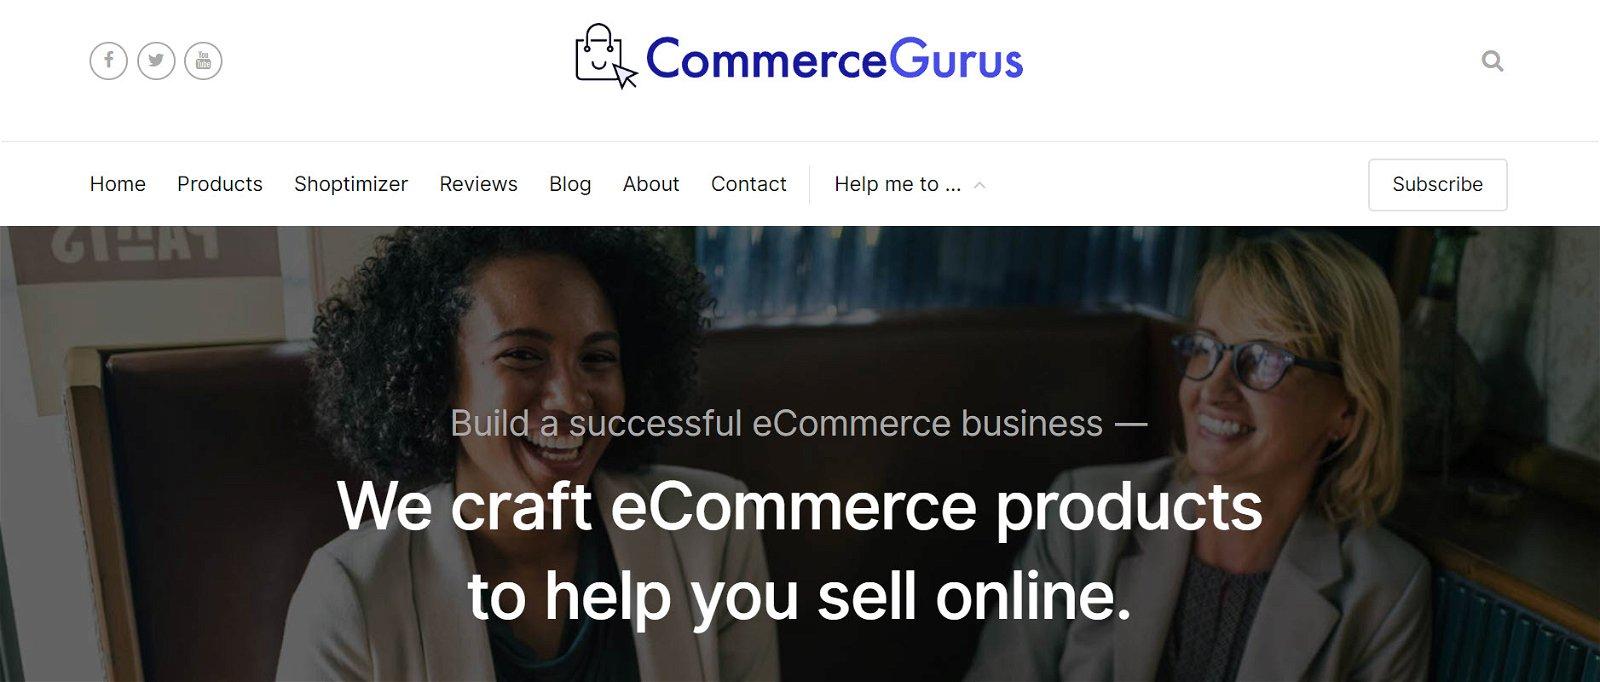 Simon Tomkins from CommerceGurus.com